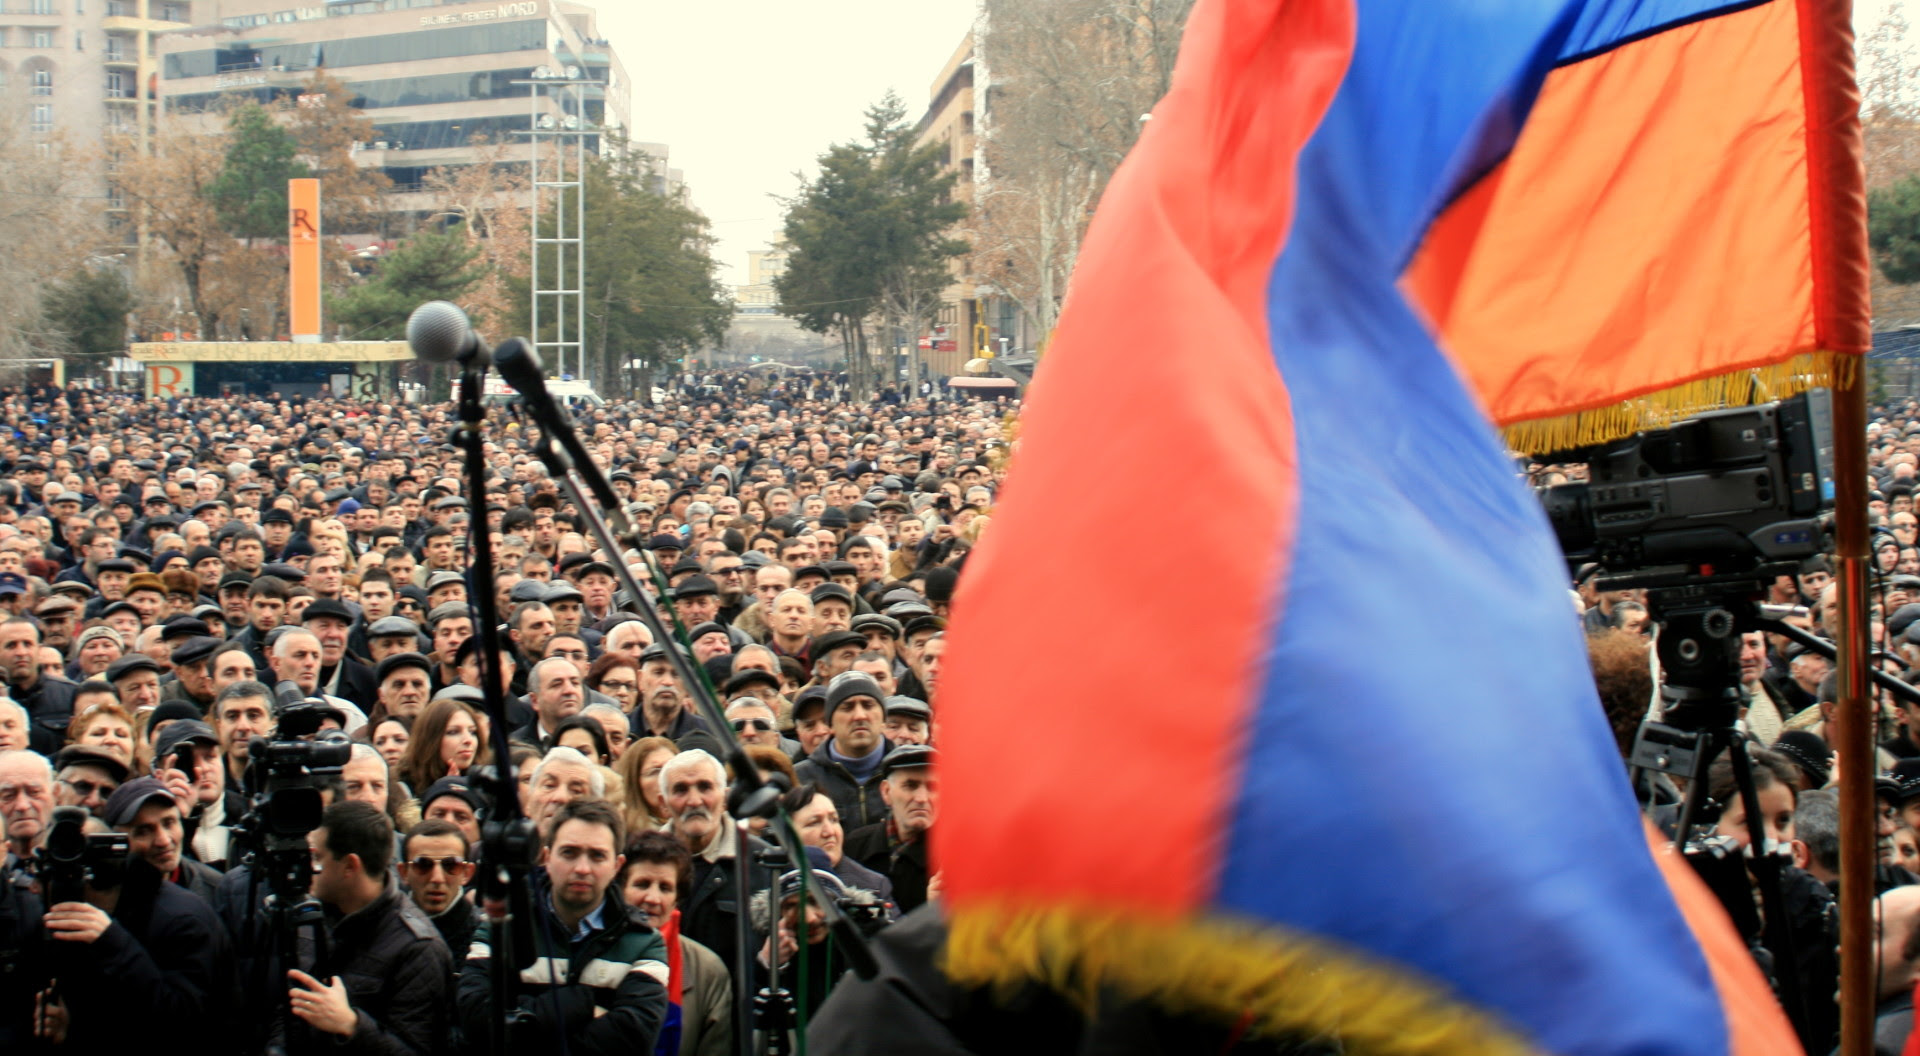 http://www.armenianweekly.com/wp-content/uploads/2013/03/IMG_85461.jpg